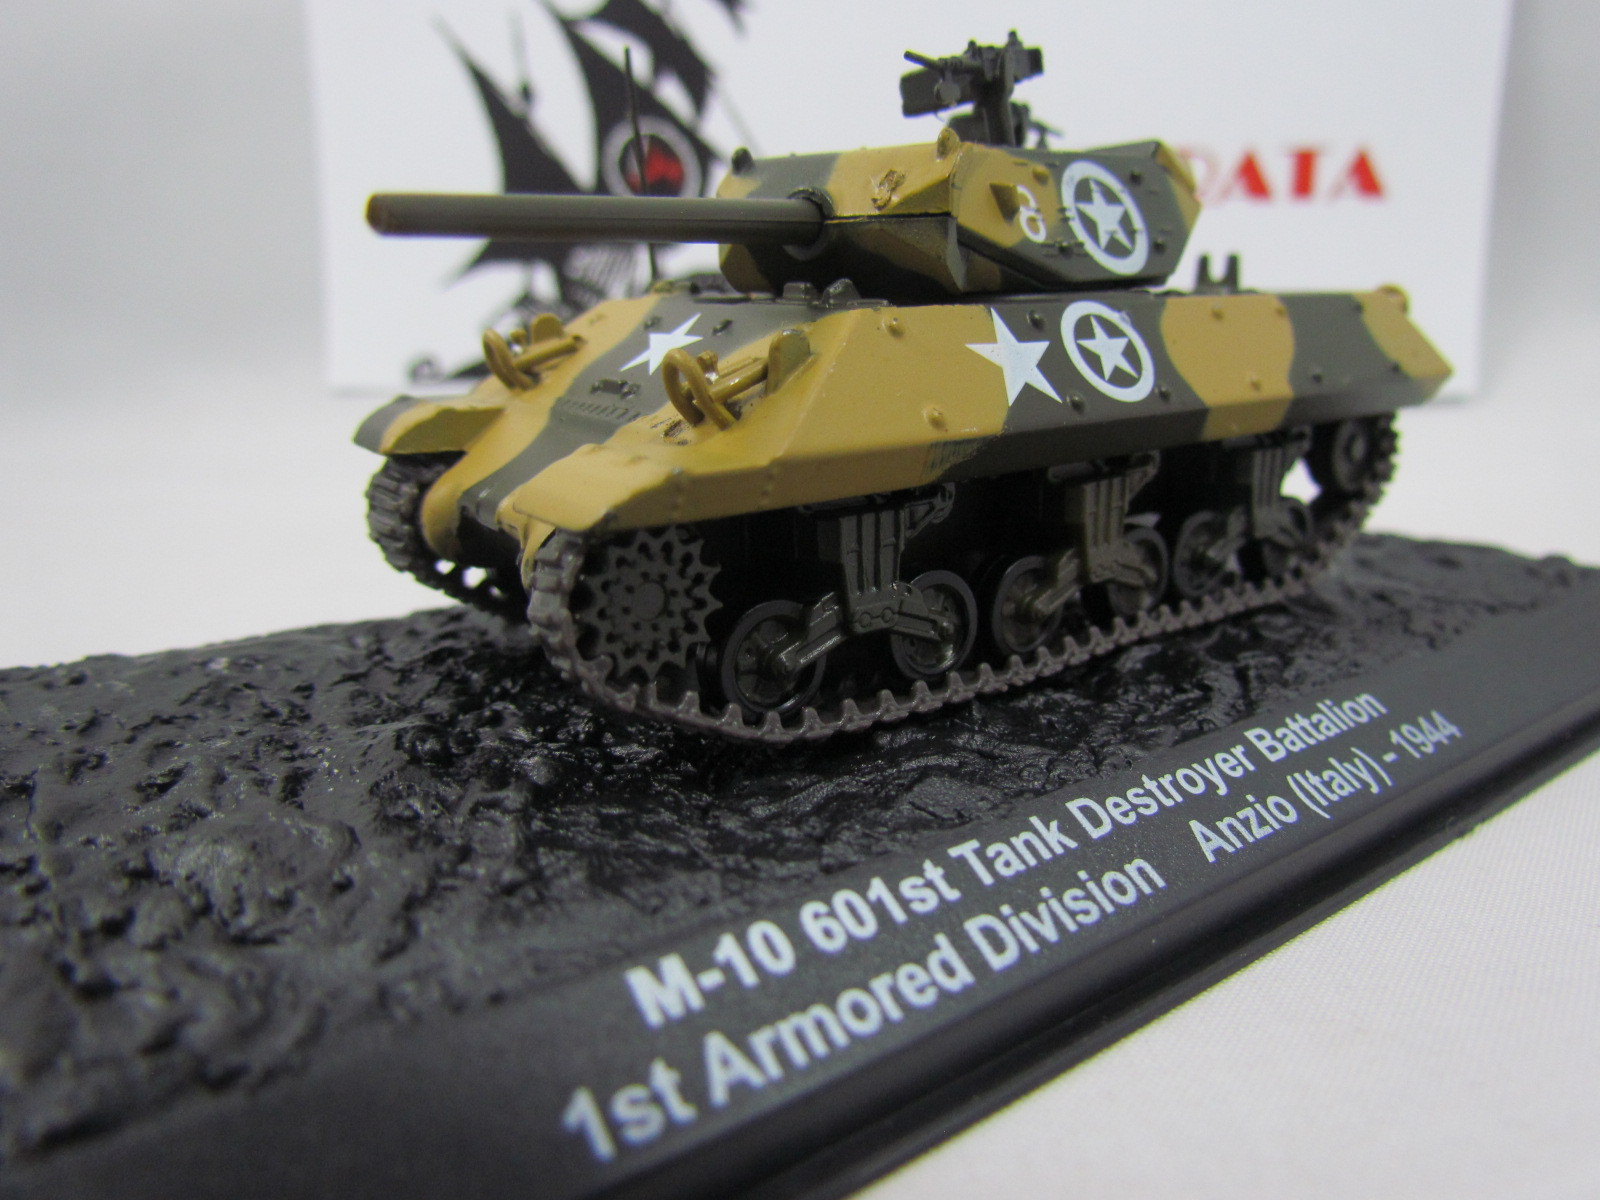 Blindado M-10 Tank Destroyer 601st Battalion 1st Armored Division Anzio (Italy) - 1944 IXO ALTAYA - 1:72 #07